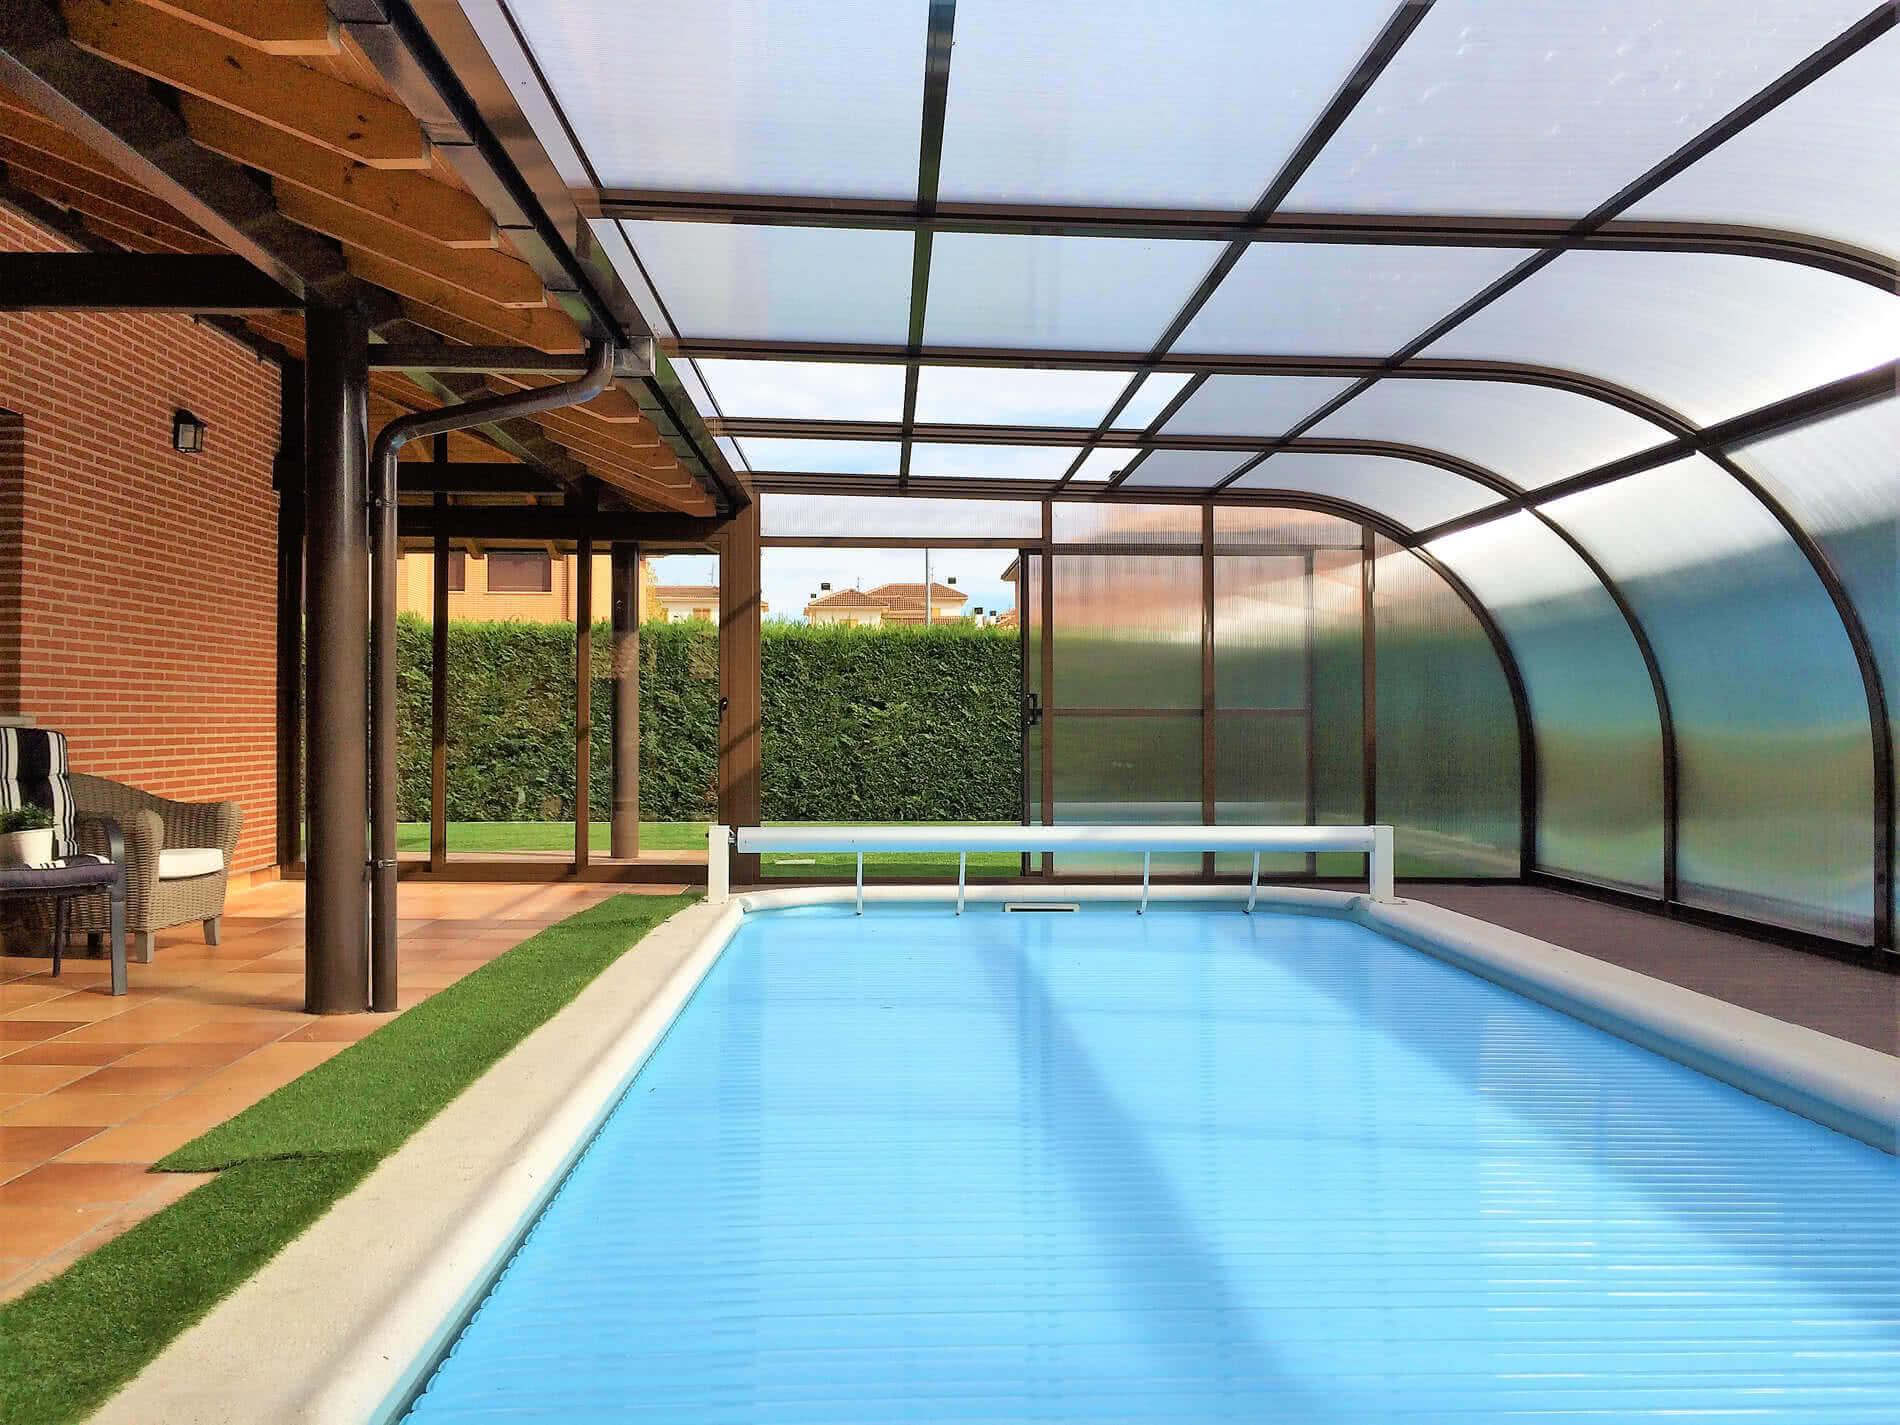 Etna cubierta alta de estructura fija para piscinas for Estructura para piscina